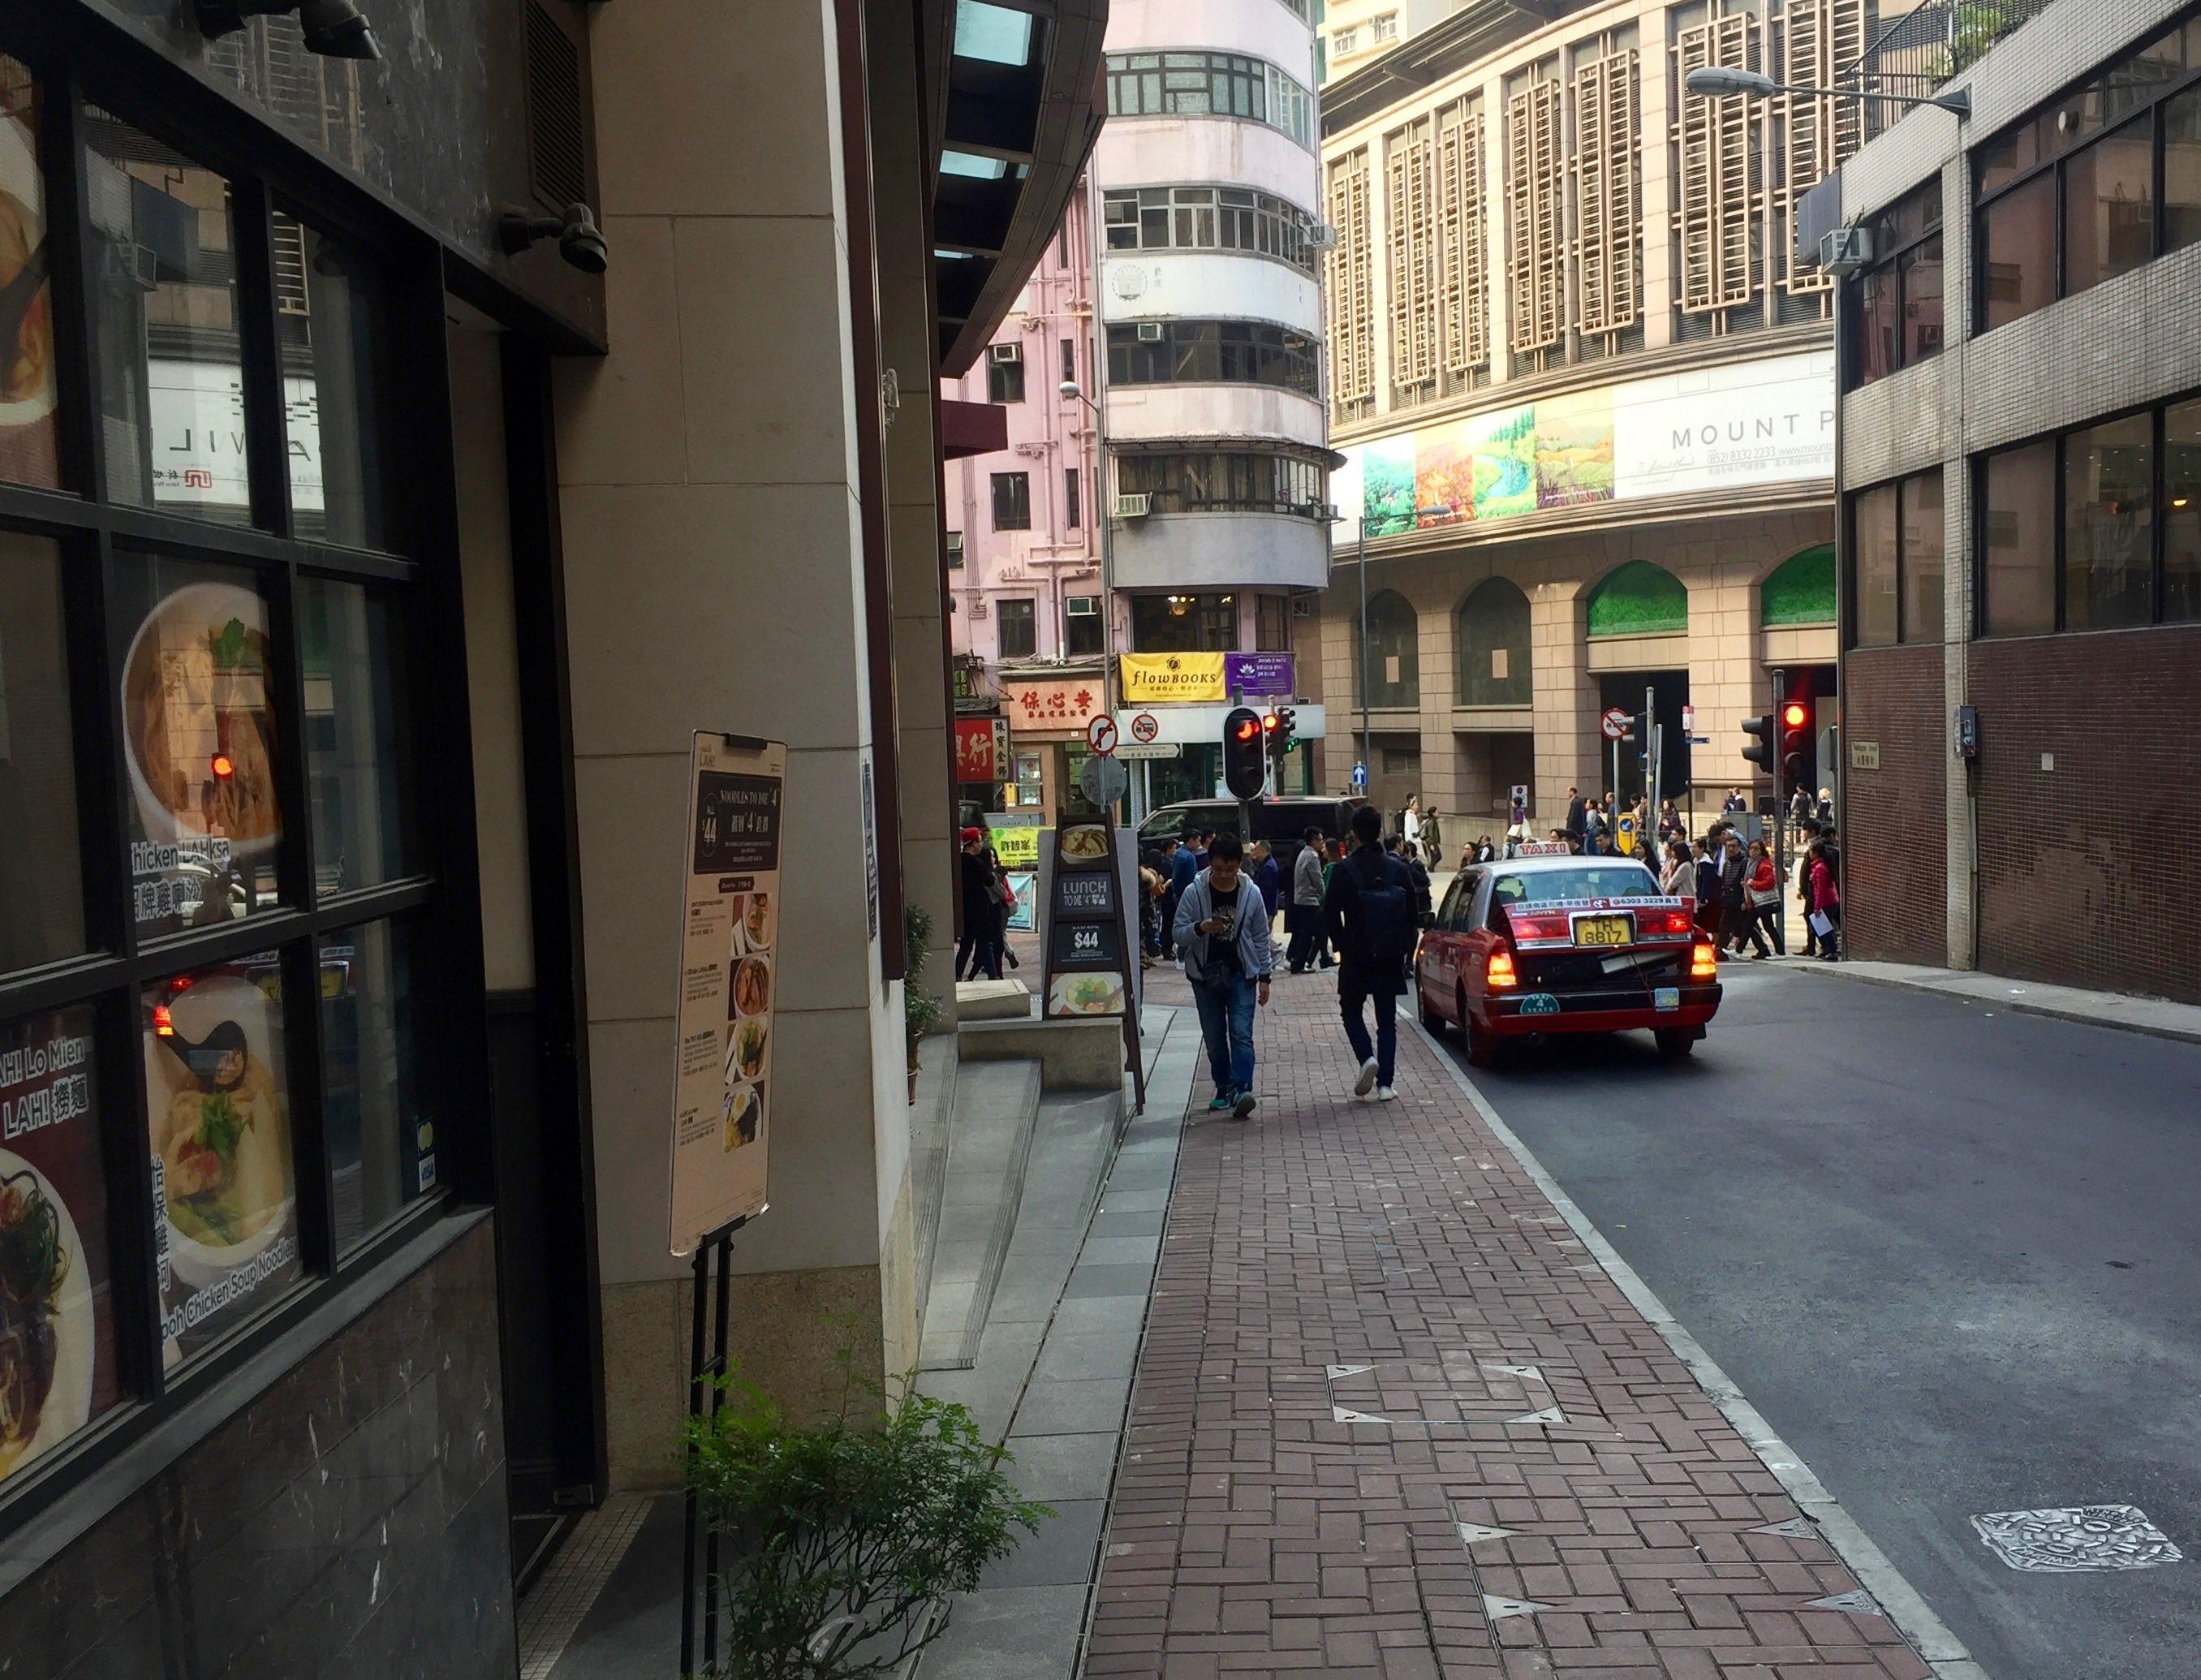 HK Central Wellington Street high-traffic location for restaurants bars